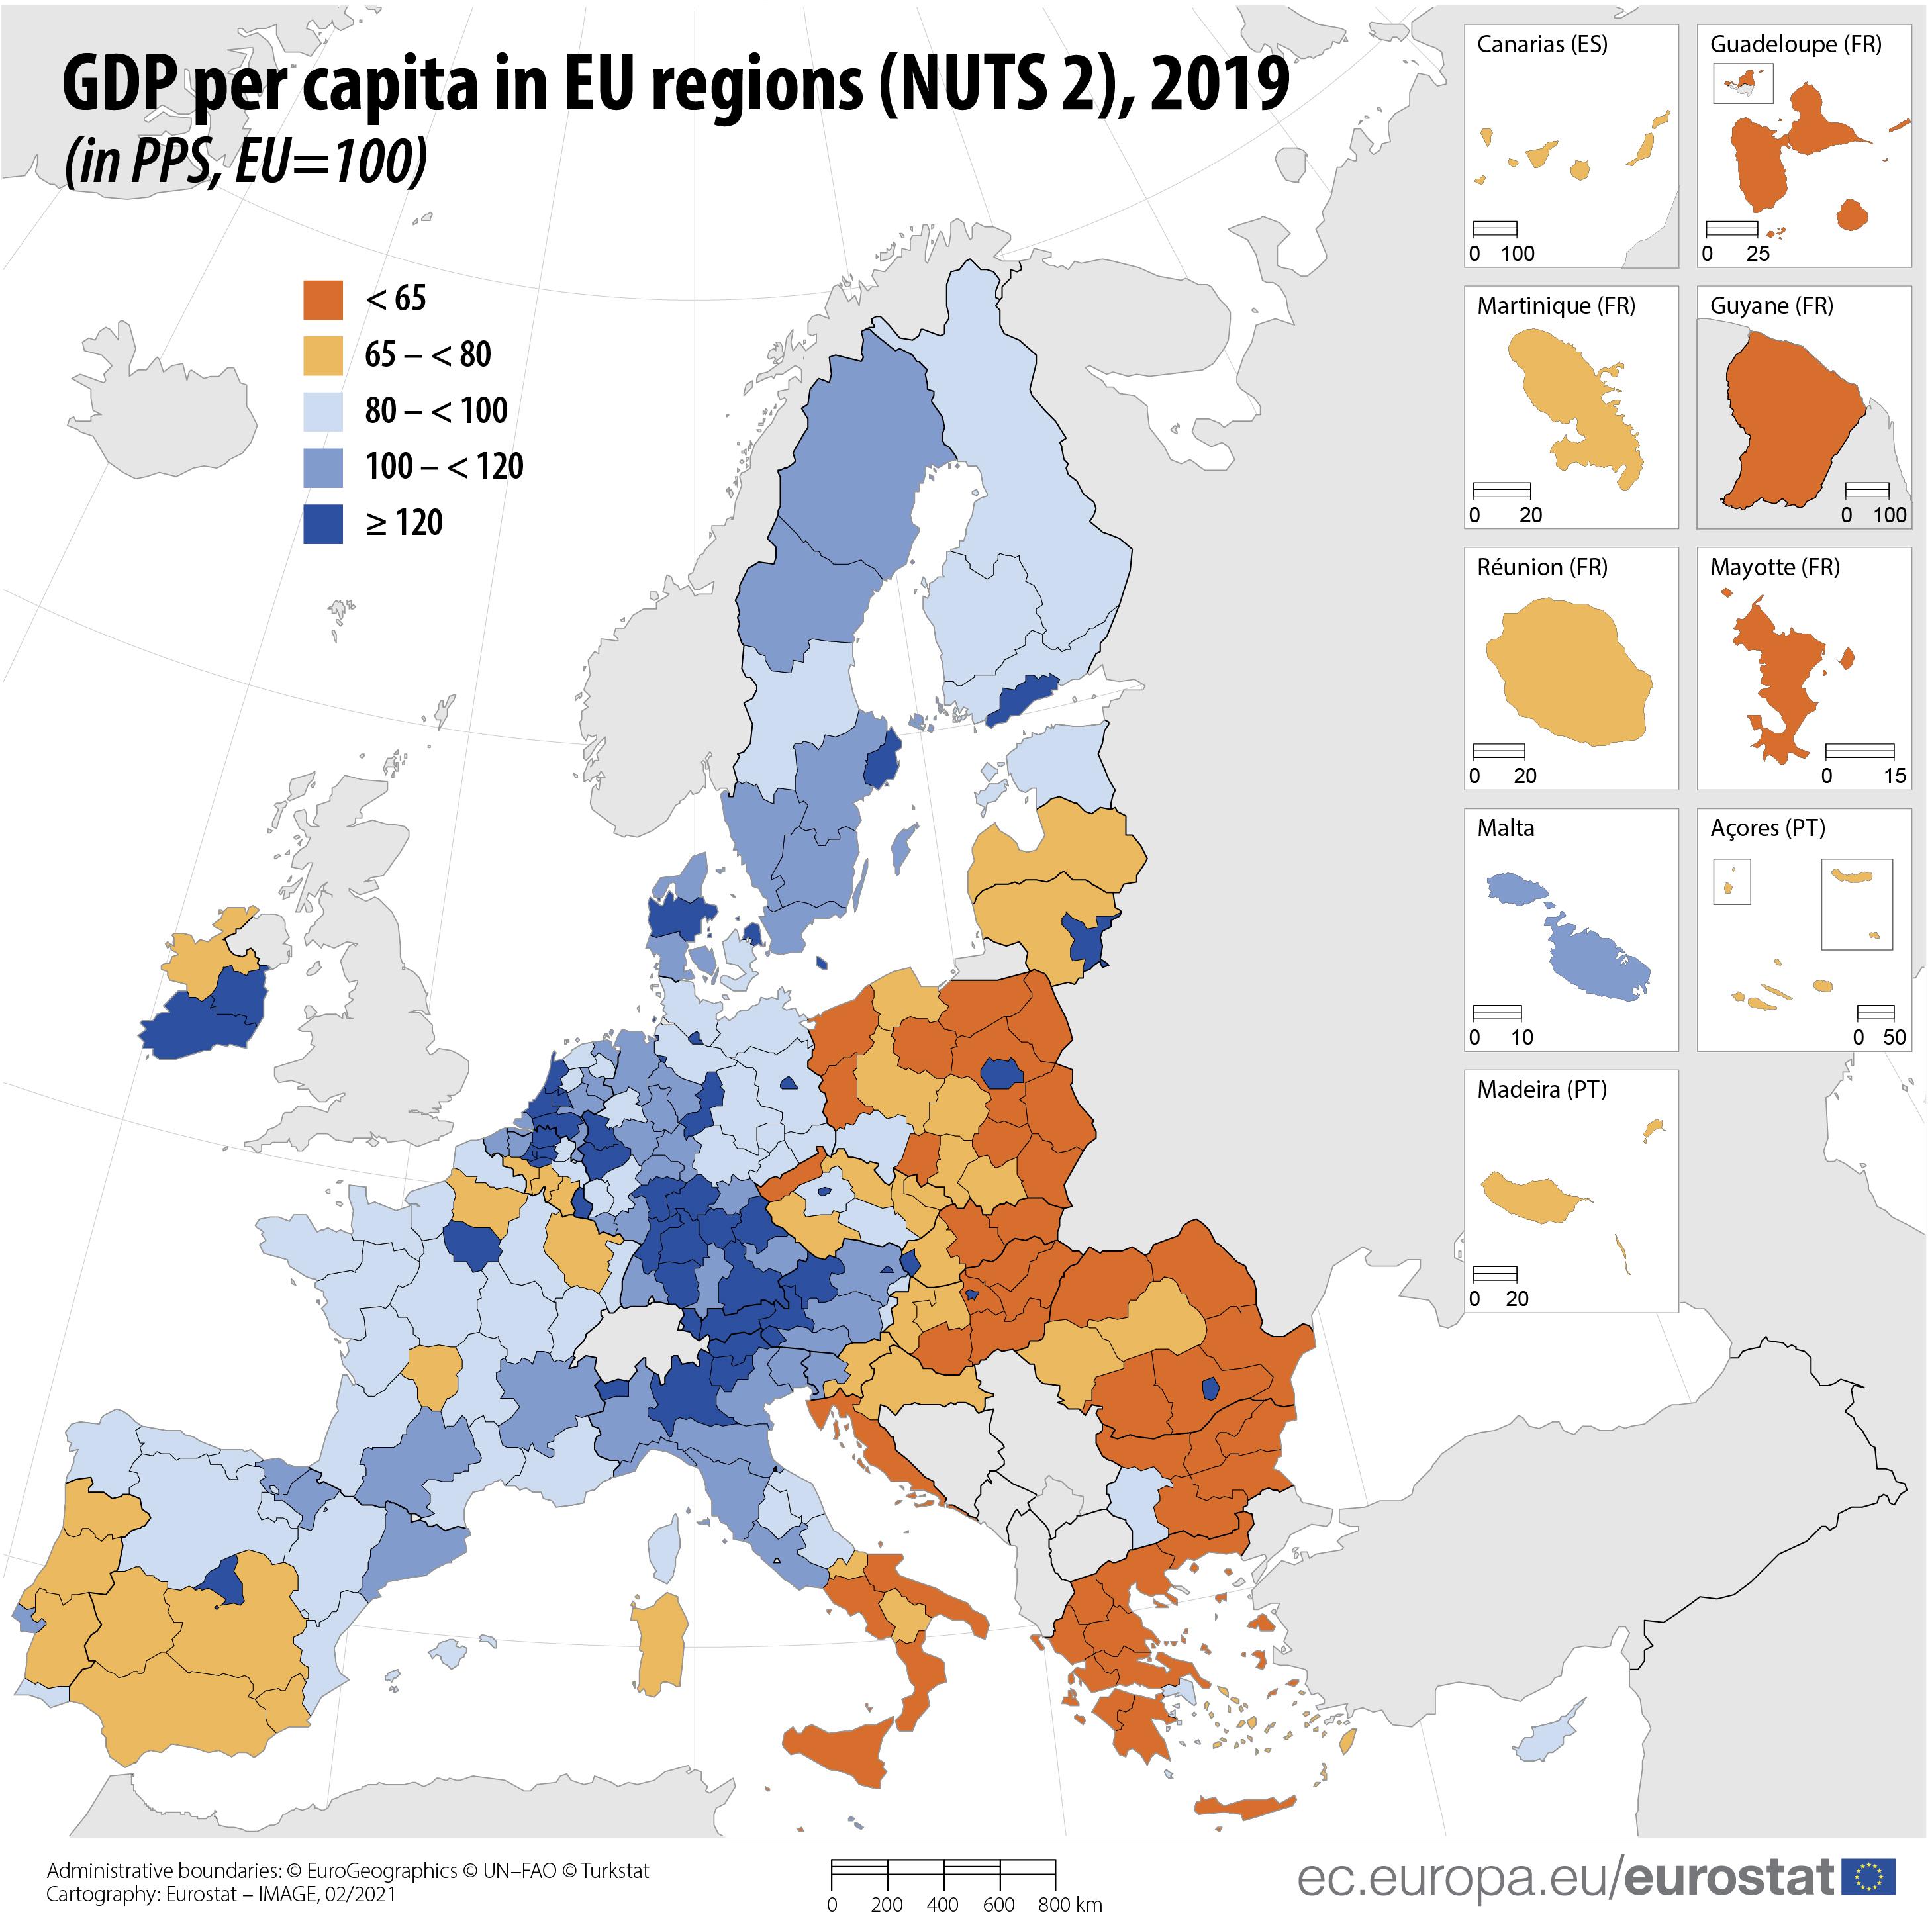 GDP per capita across EU regions, 2019